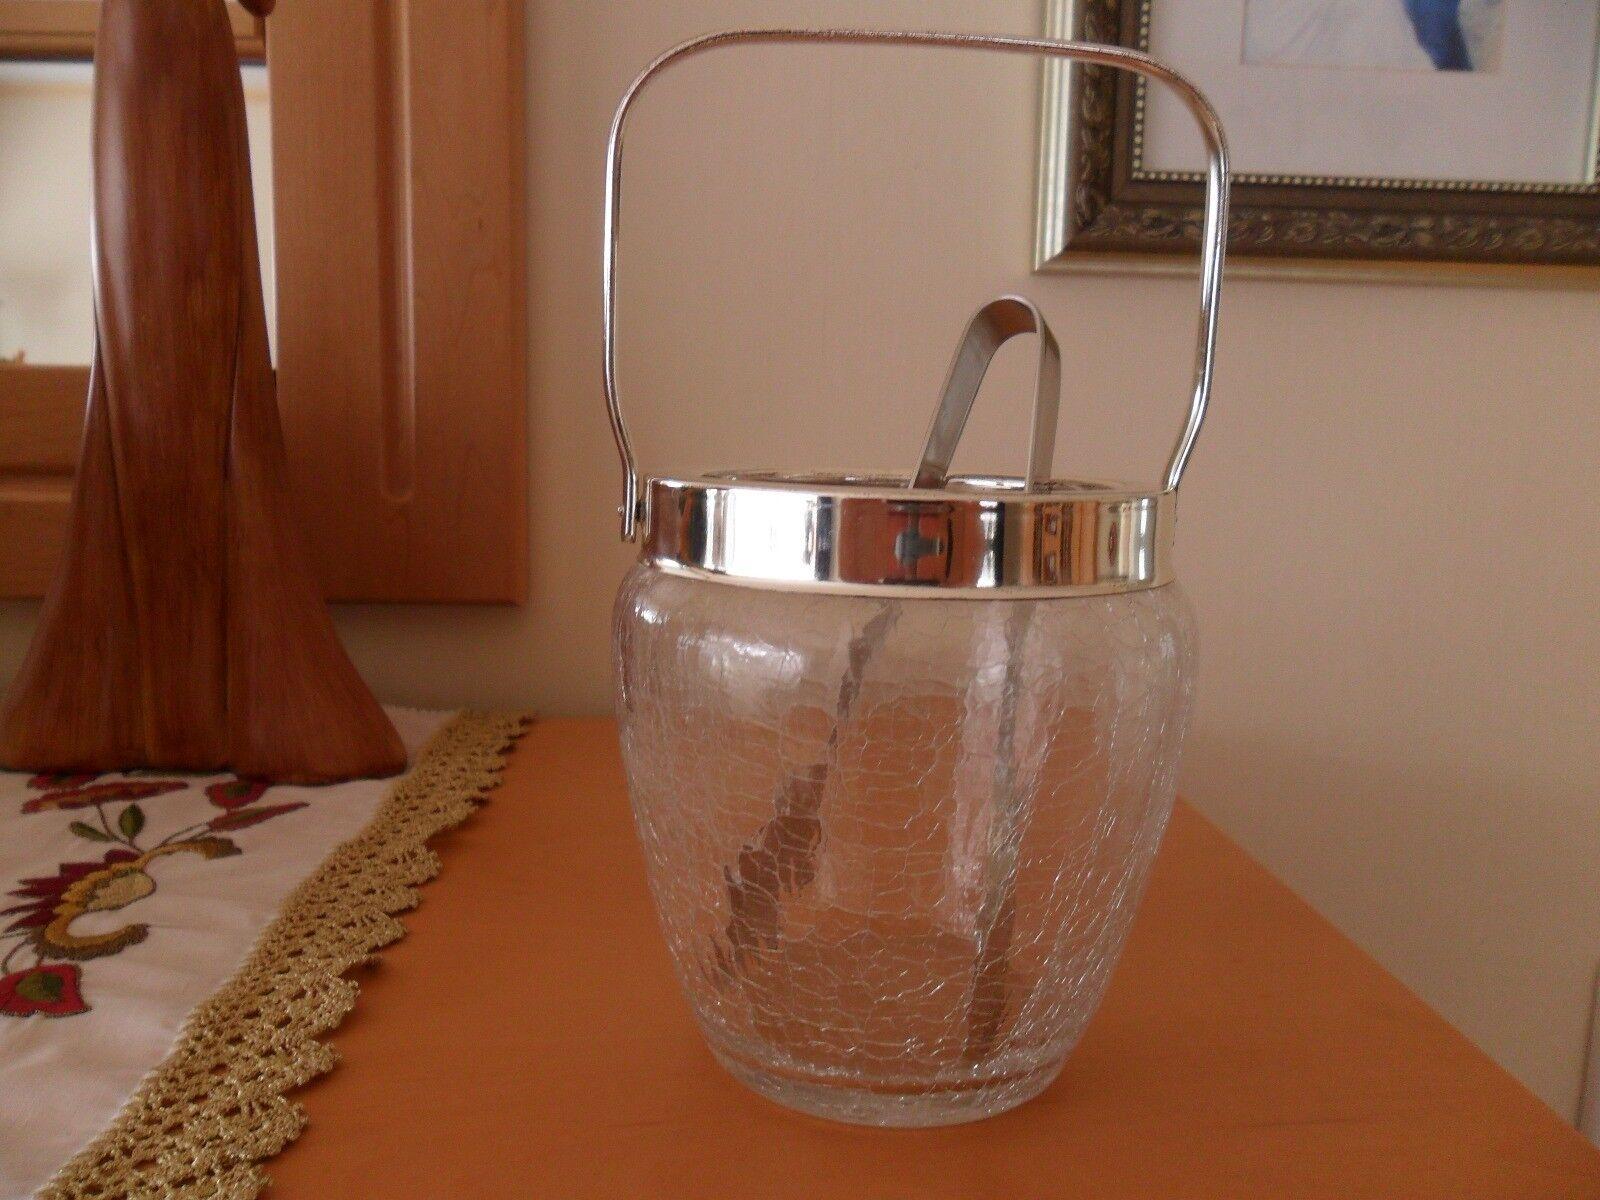 Eiswürfelbehälter, Eiswürfelbehälter, Eiswürfelbehälter, Eiskübel, Craquele Glas, 60er Jahre, Vintage | Marke  8e9305